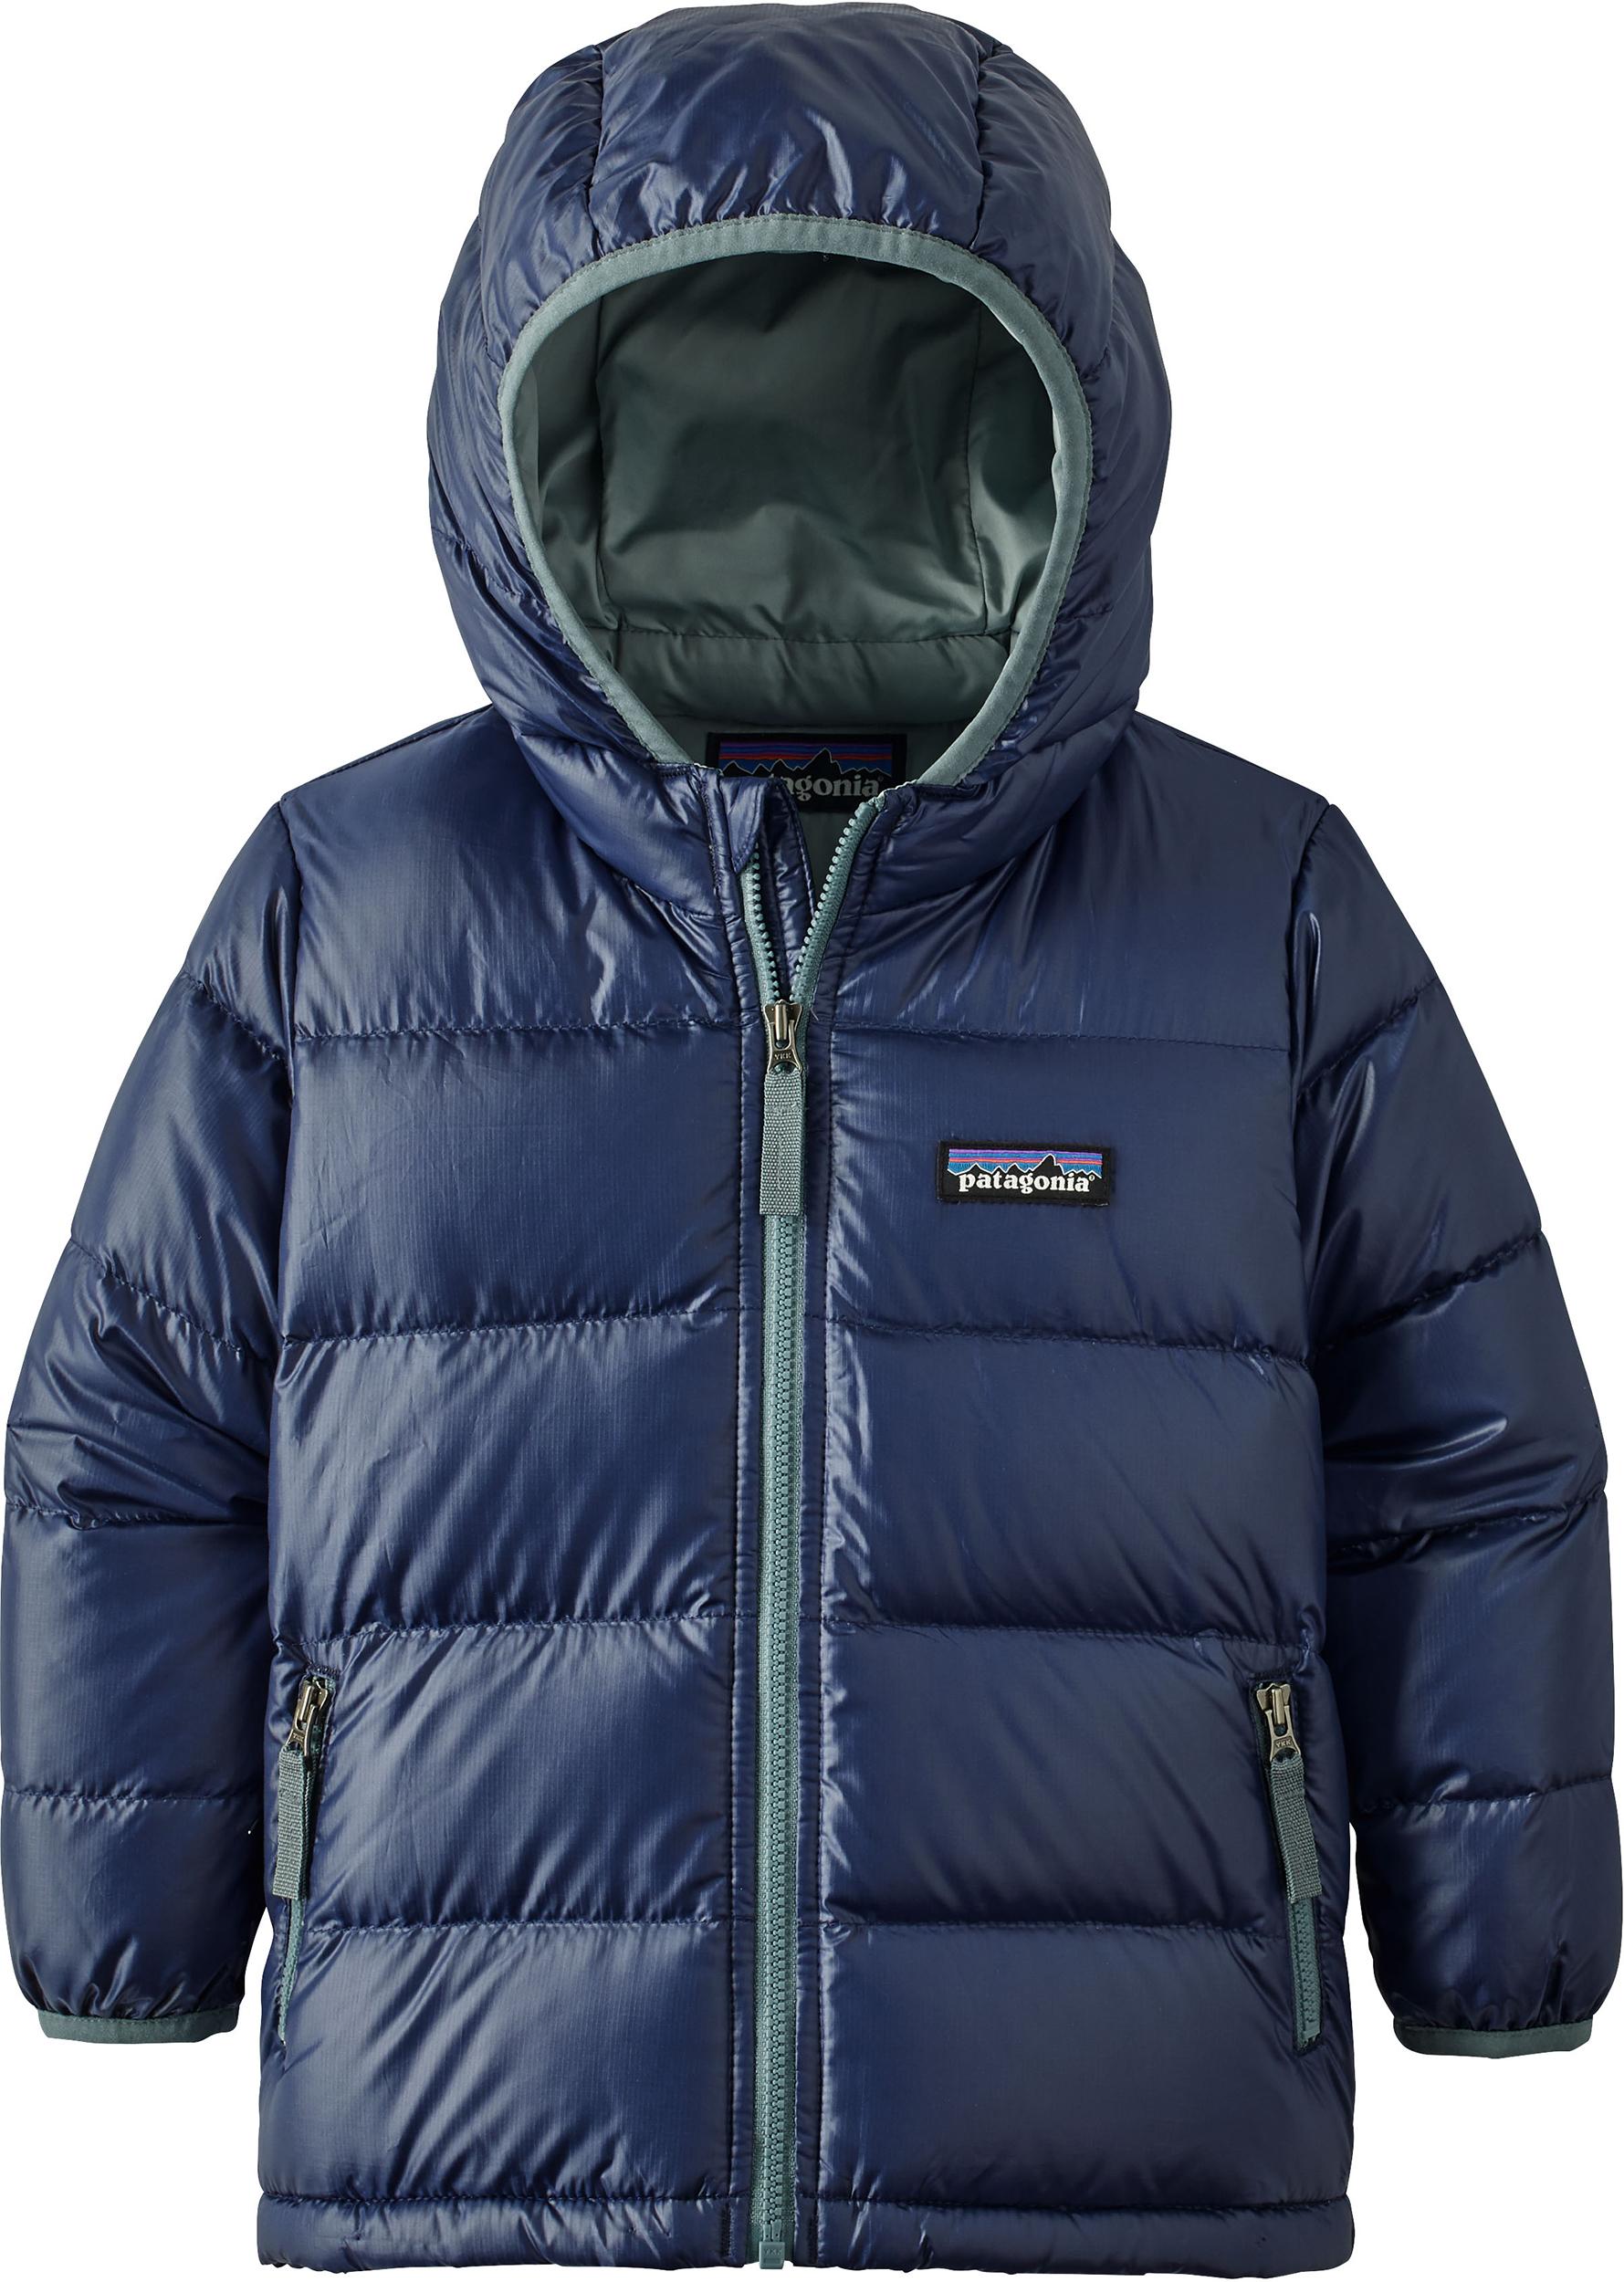 160f1d867 Patagonia Hi-Loft Down Sweater Hoody - Infants to Children | MEC